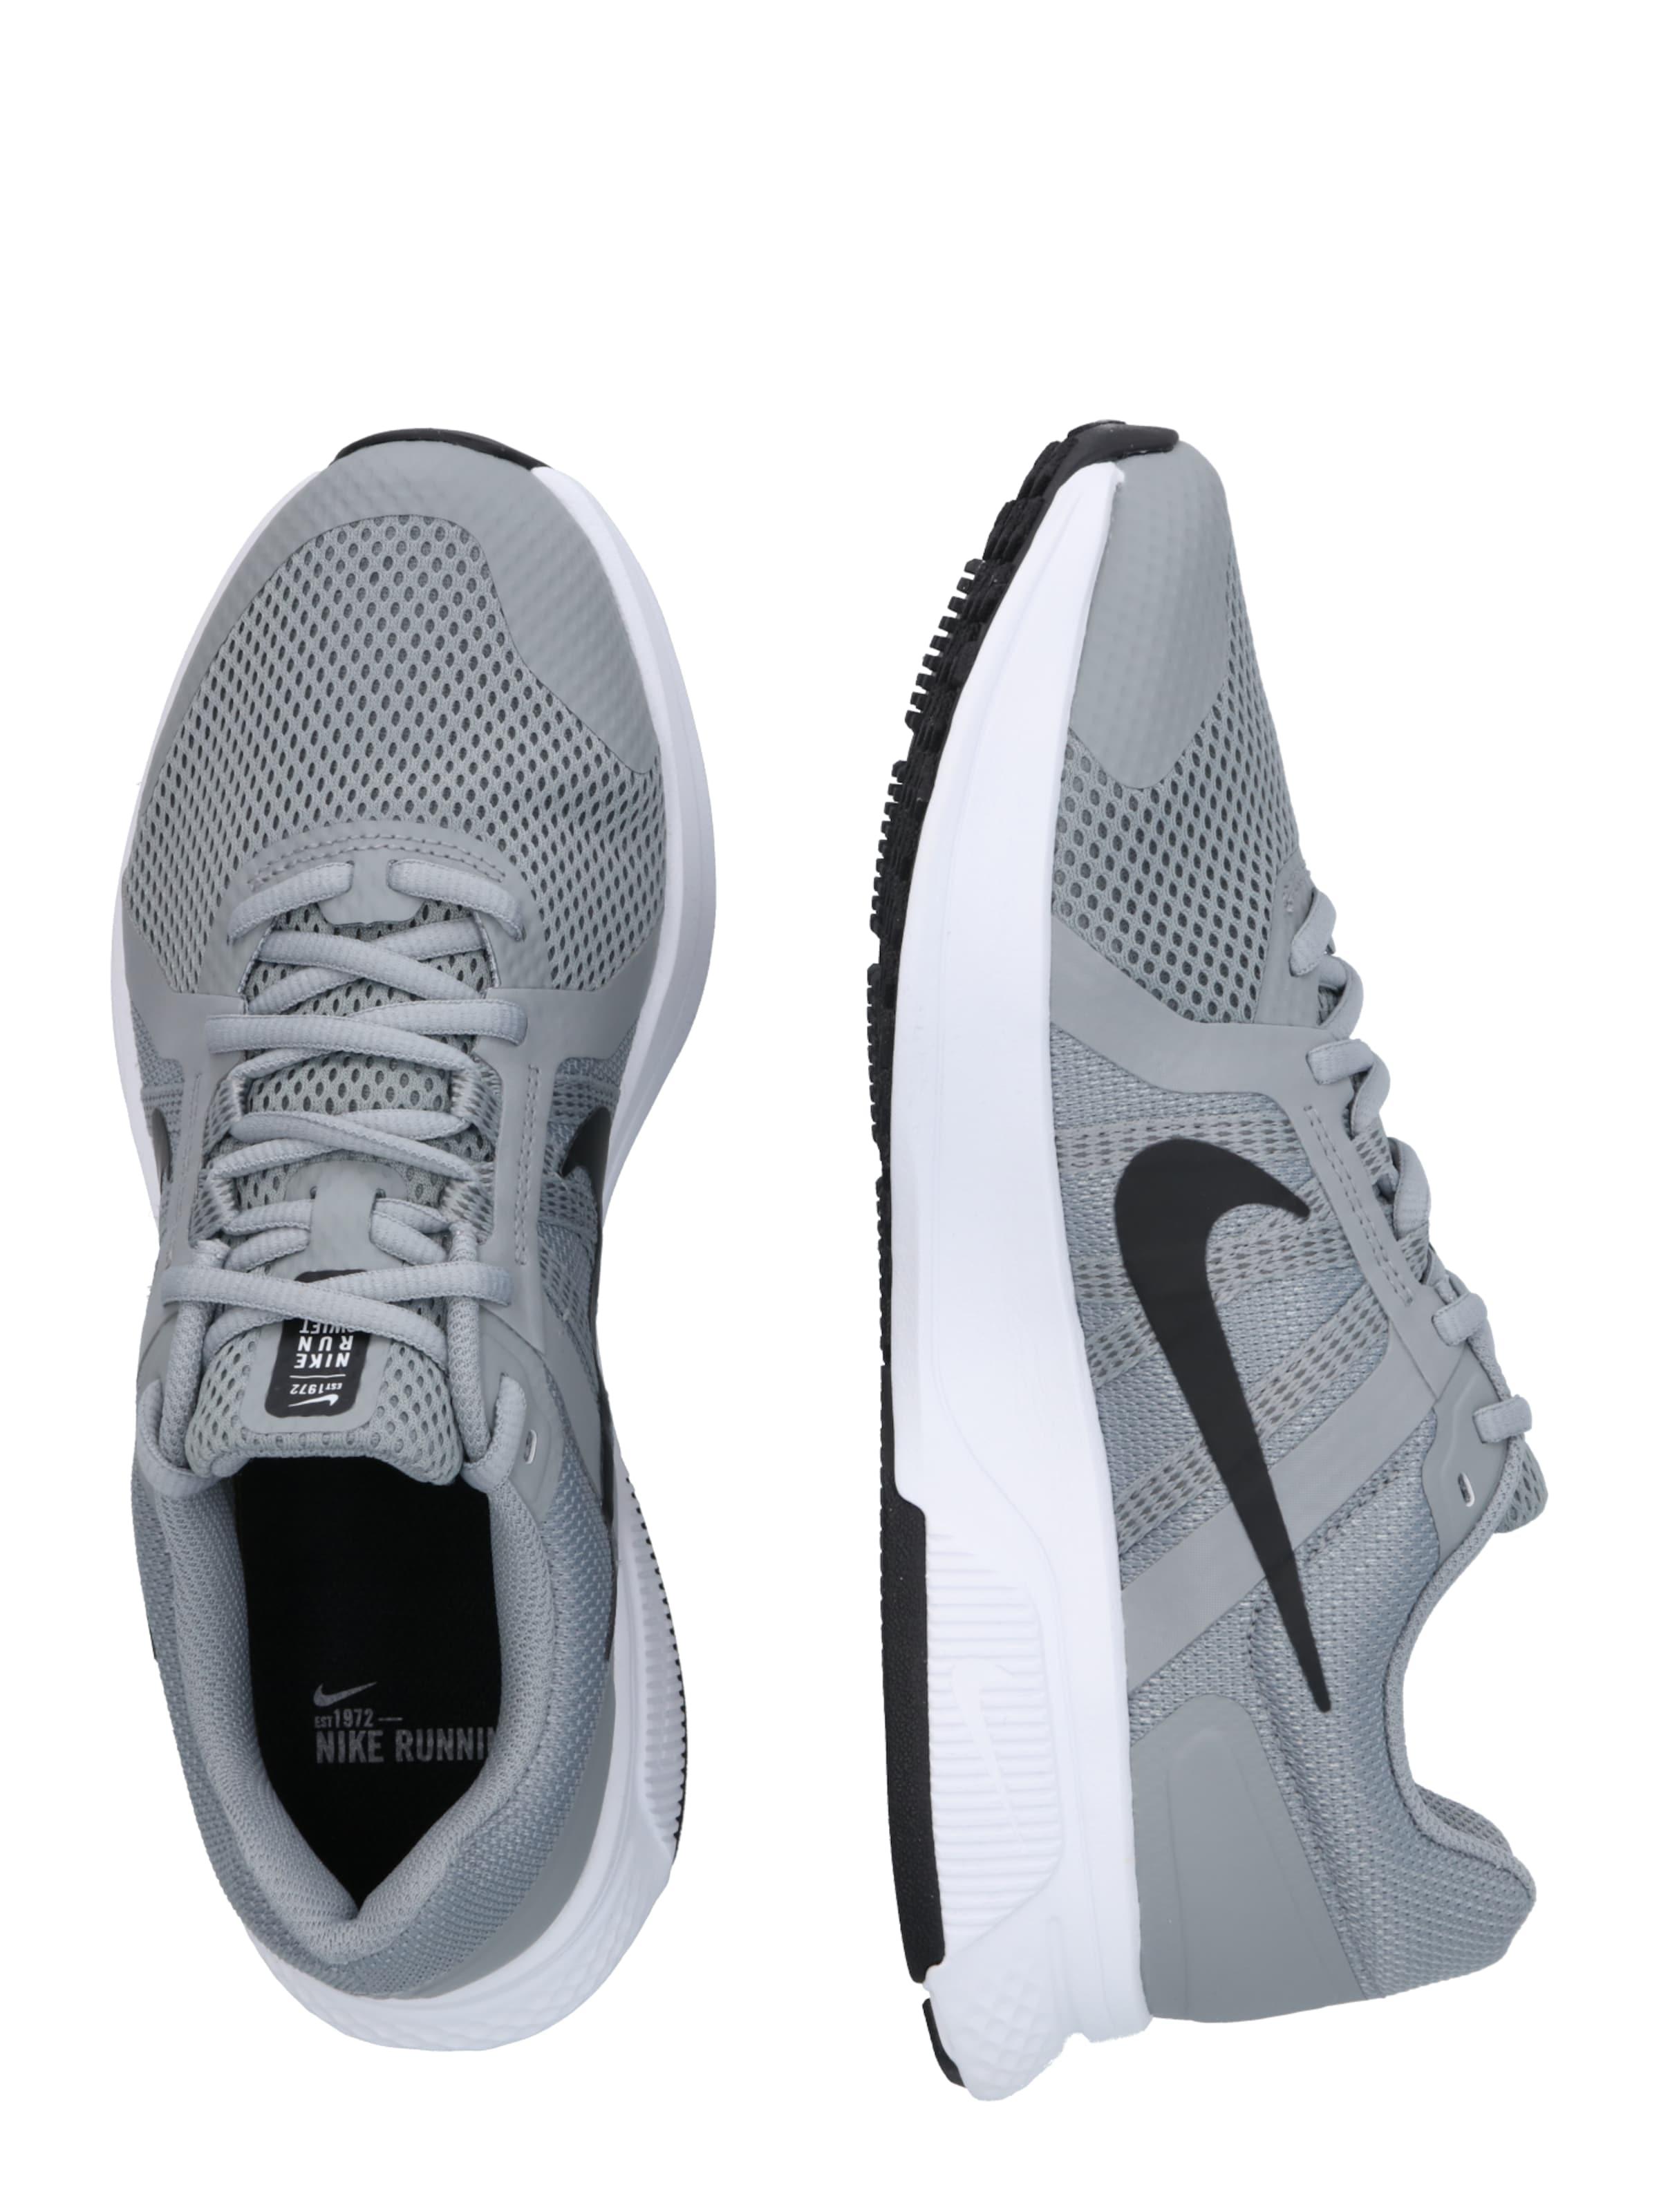 Zapatillas Nike Swift Run 2